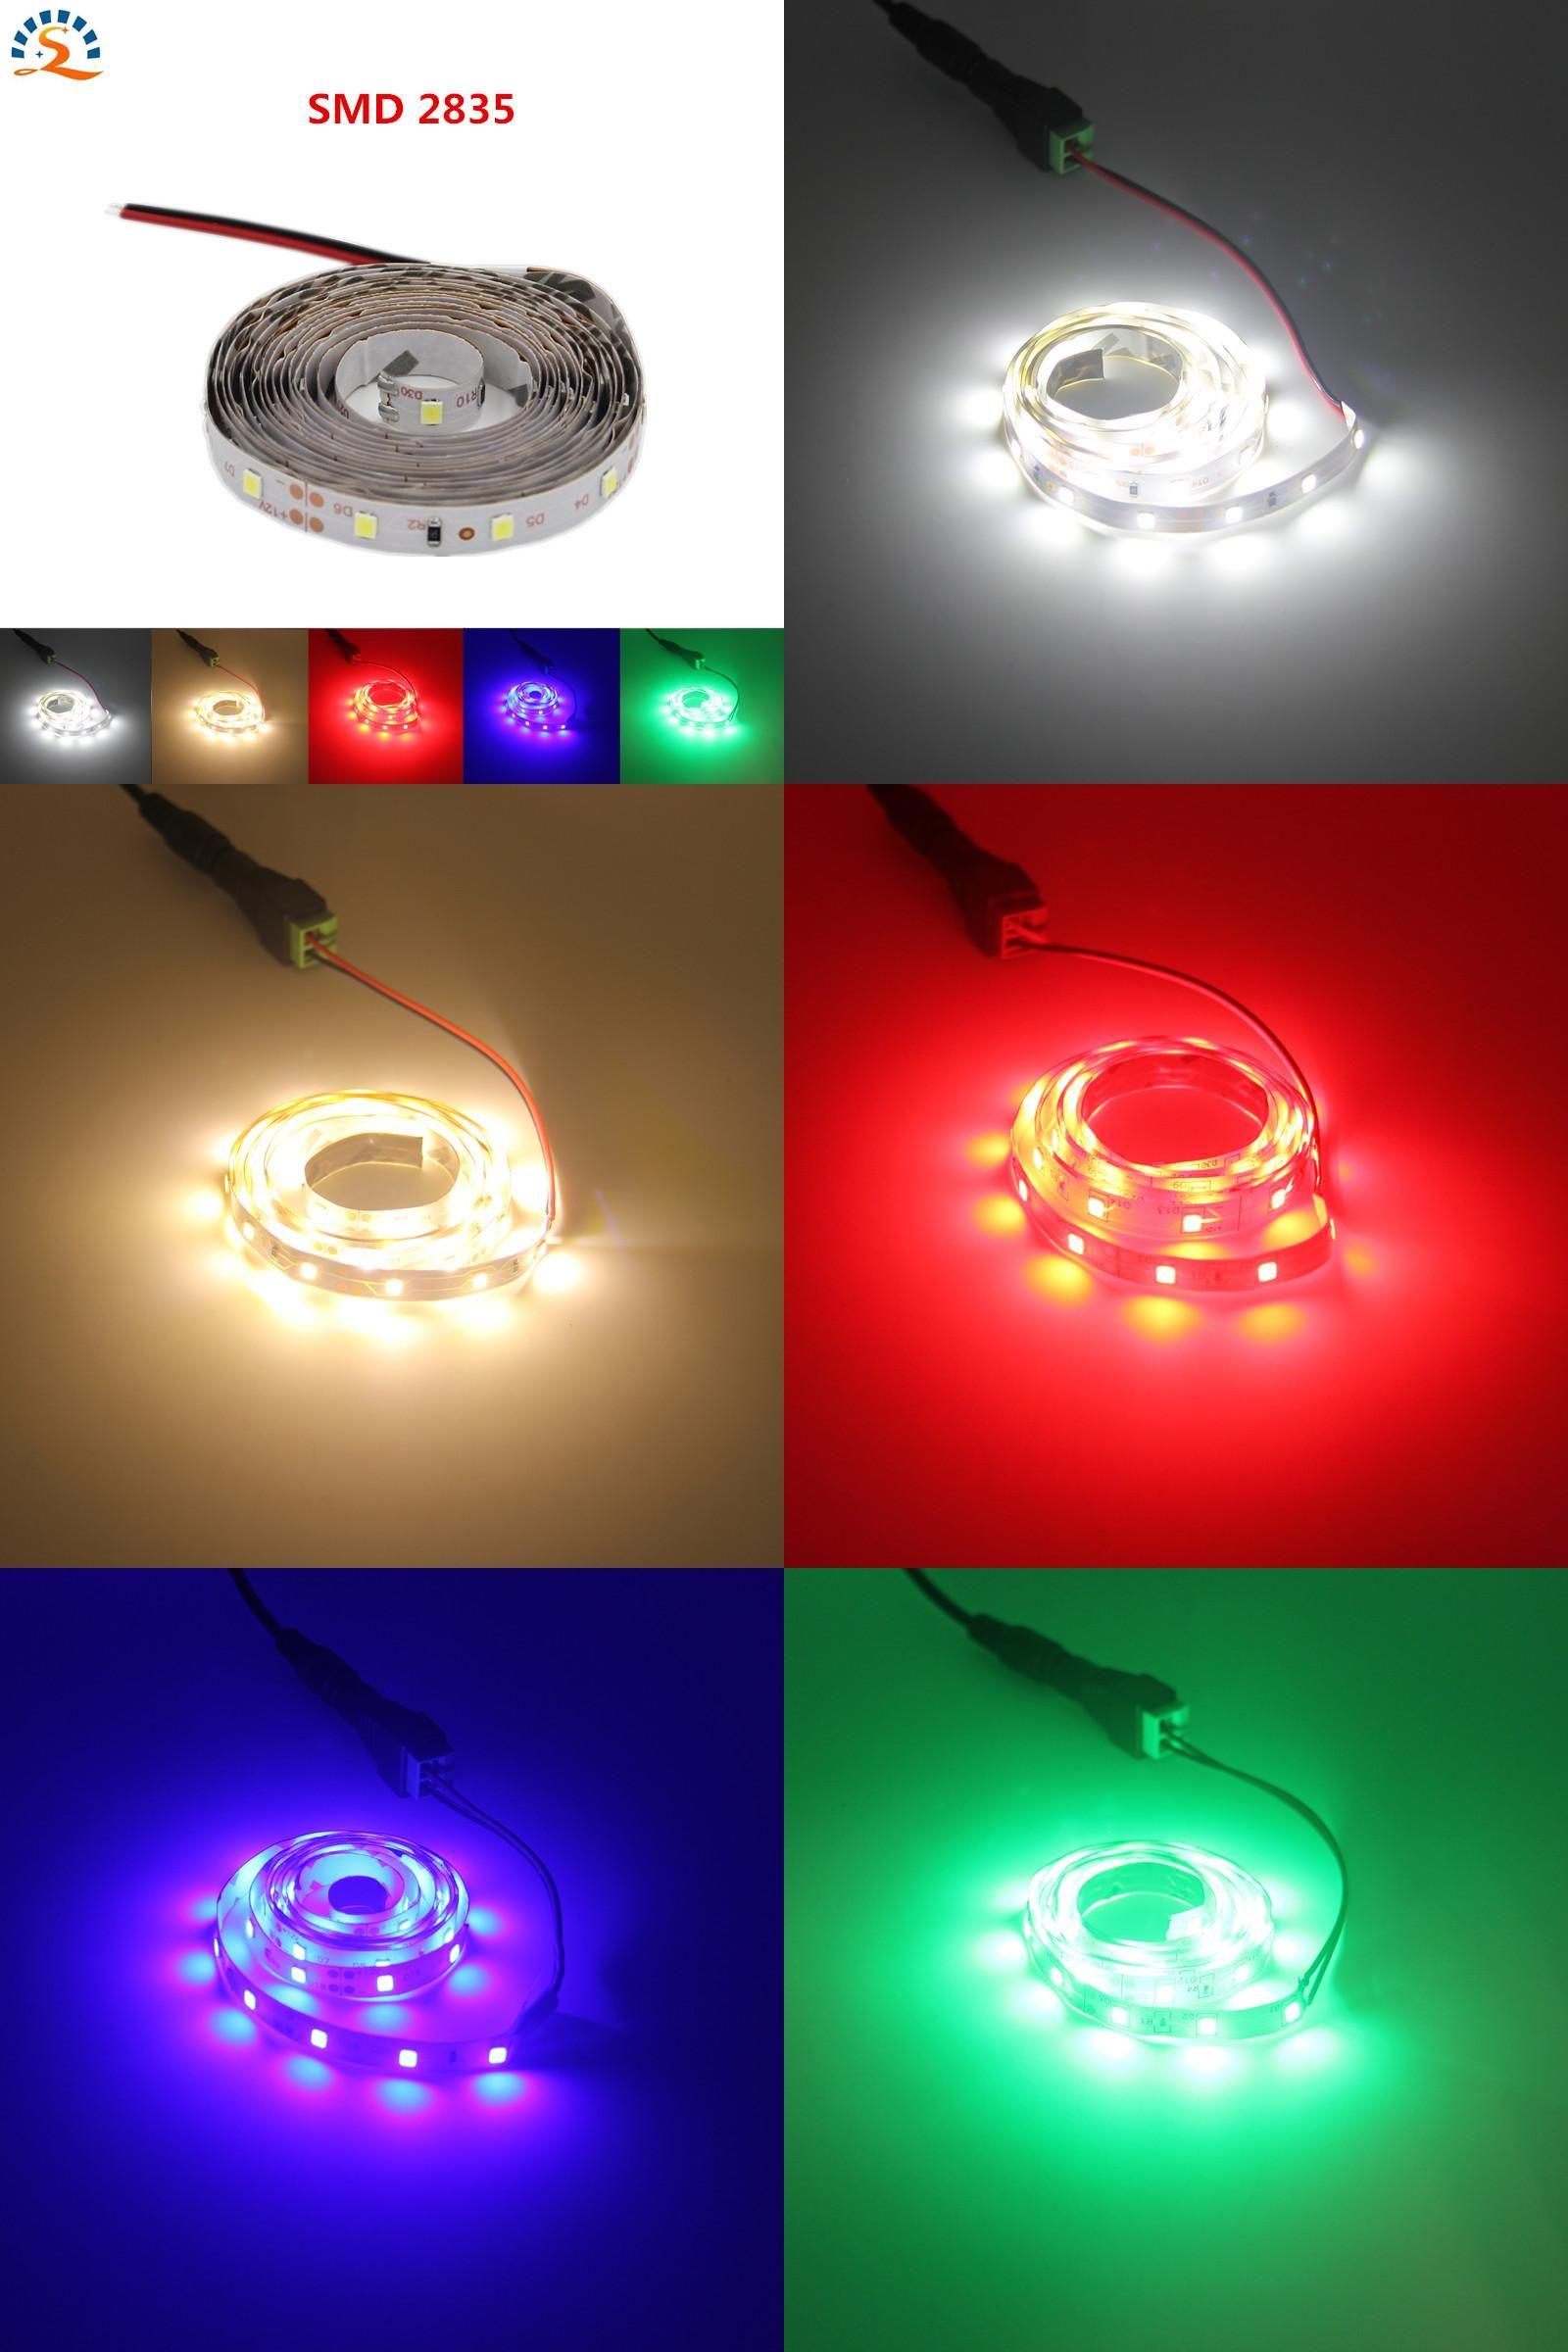 Visit To Buy 5m 3m 1m Led Strip Waterproof 300leds Flexible Lamp Belt Super Bright Rgb Led Light 12v Dc Red B Green Led Lights Led Light Lamp Rgb Led Lights